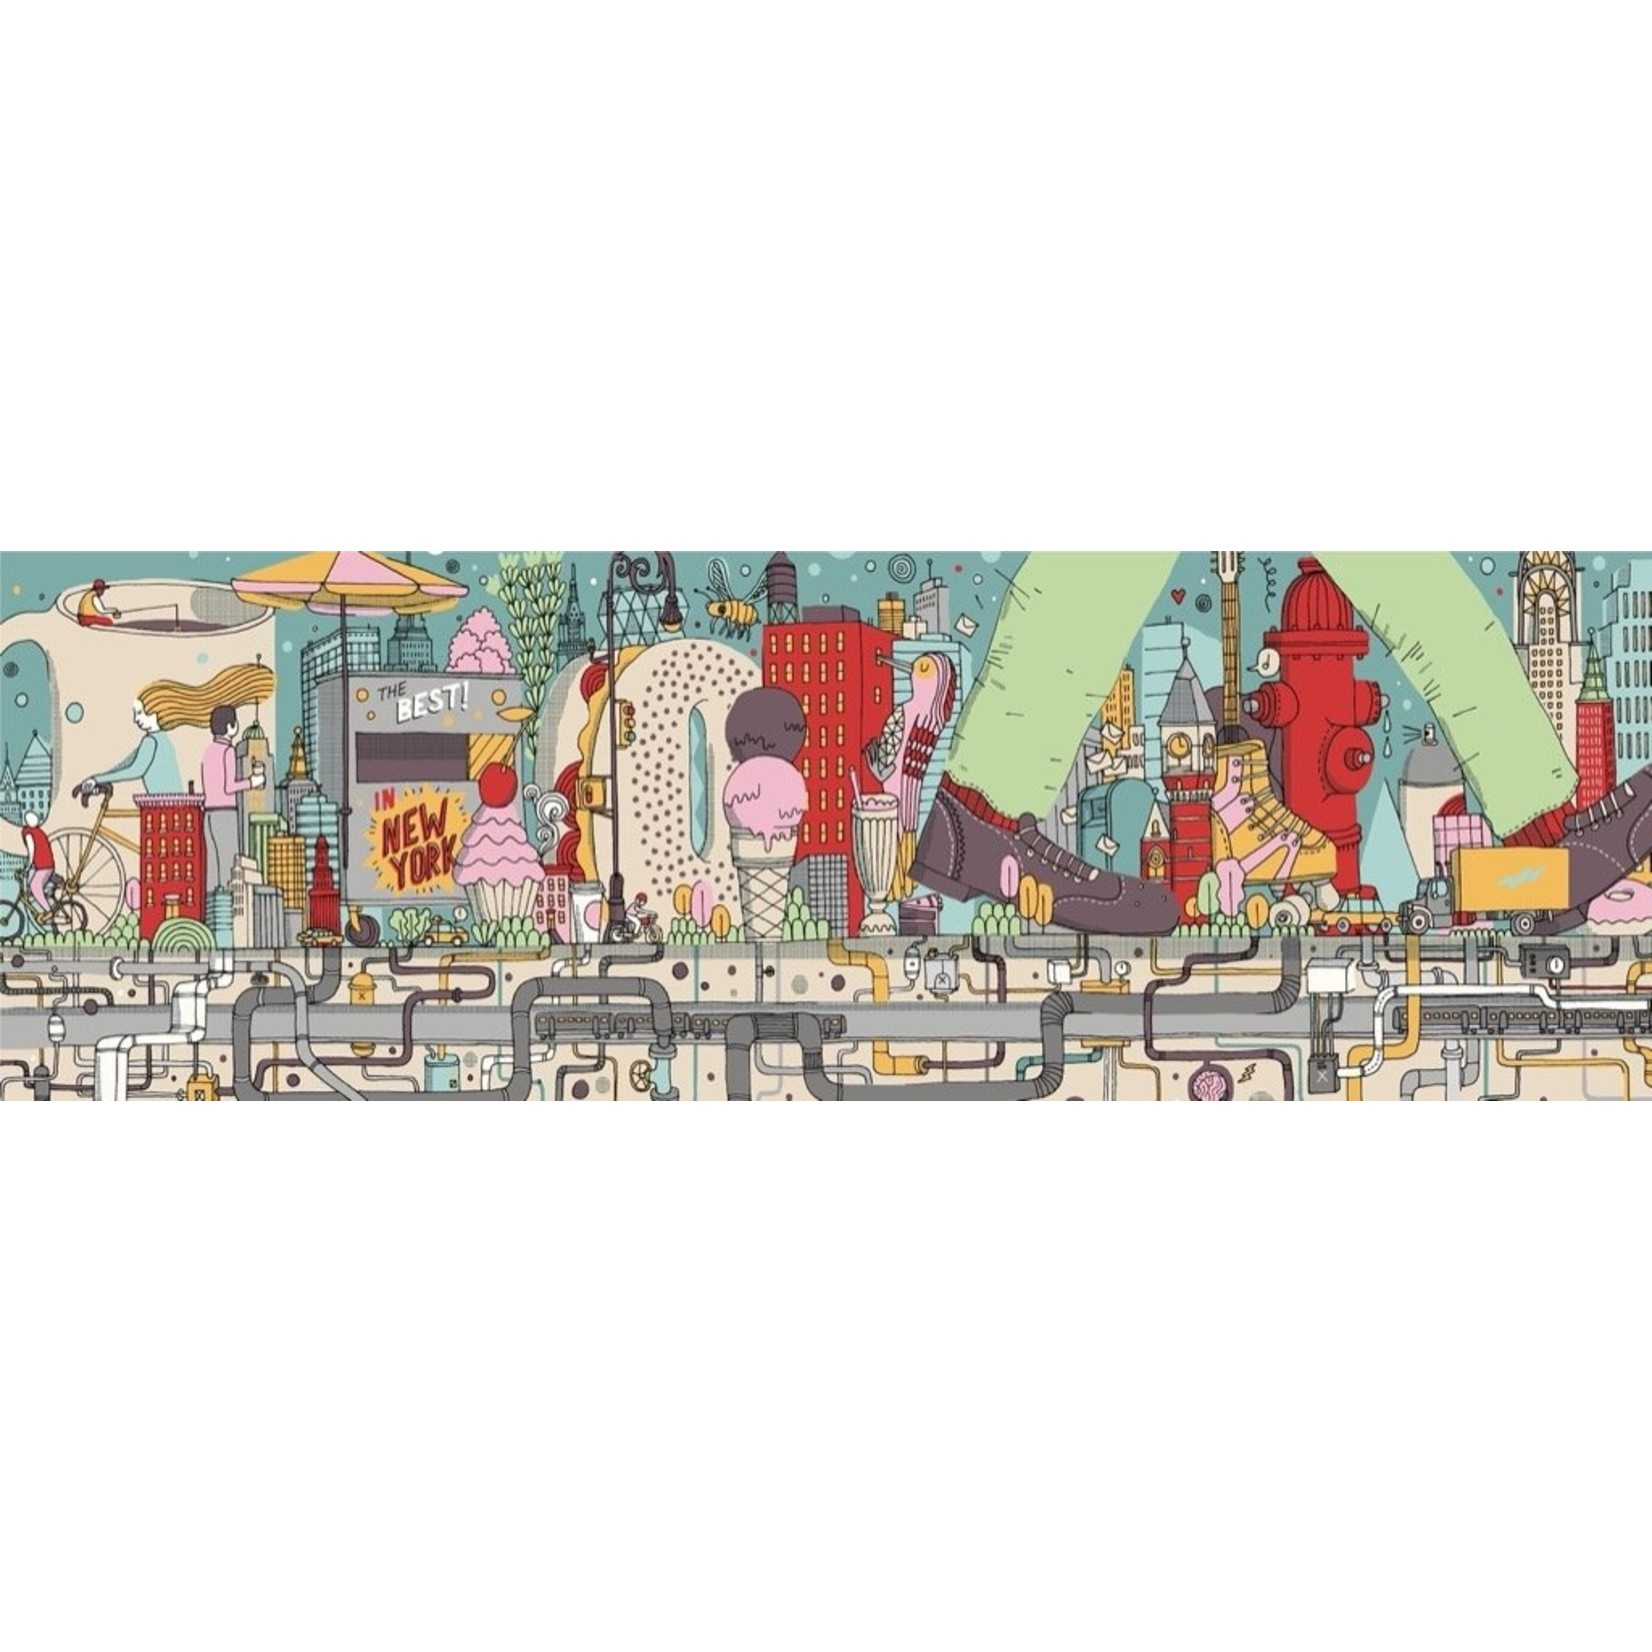 New York Puzzle Company Walking New York Puzzle